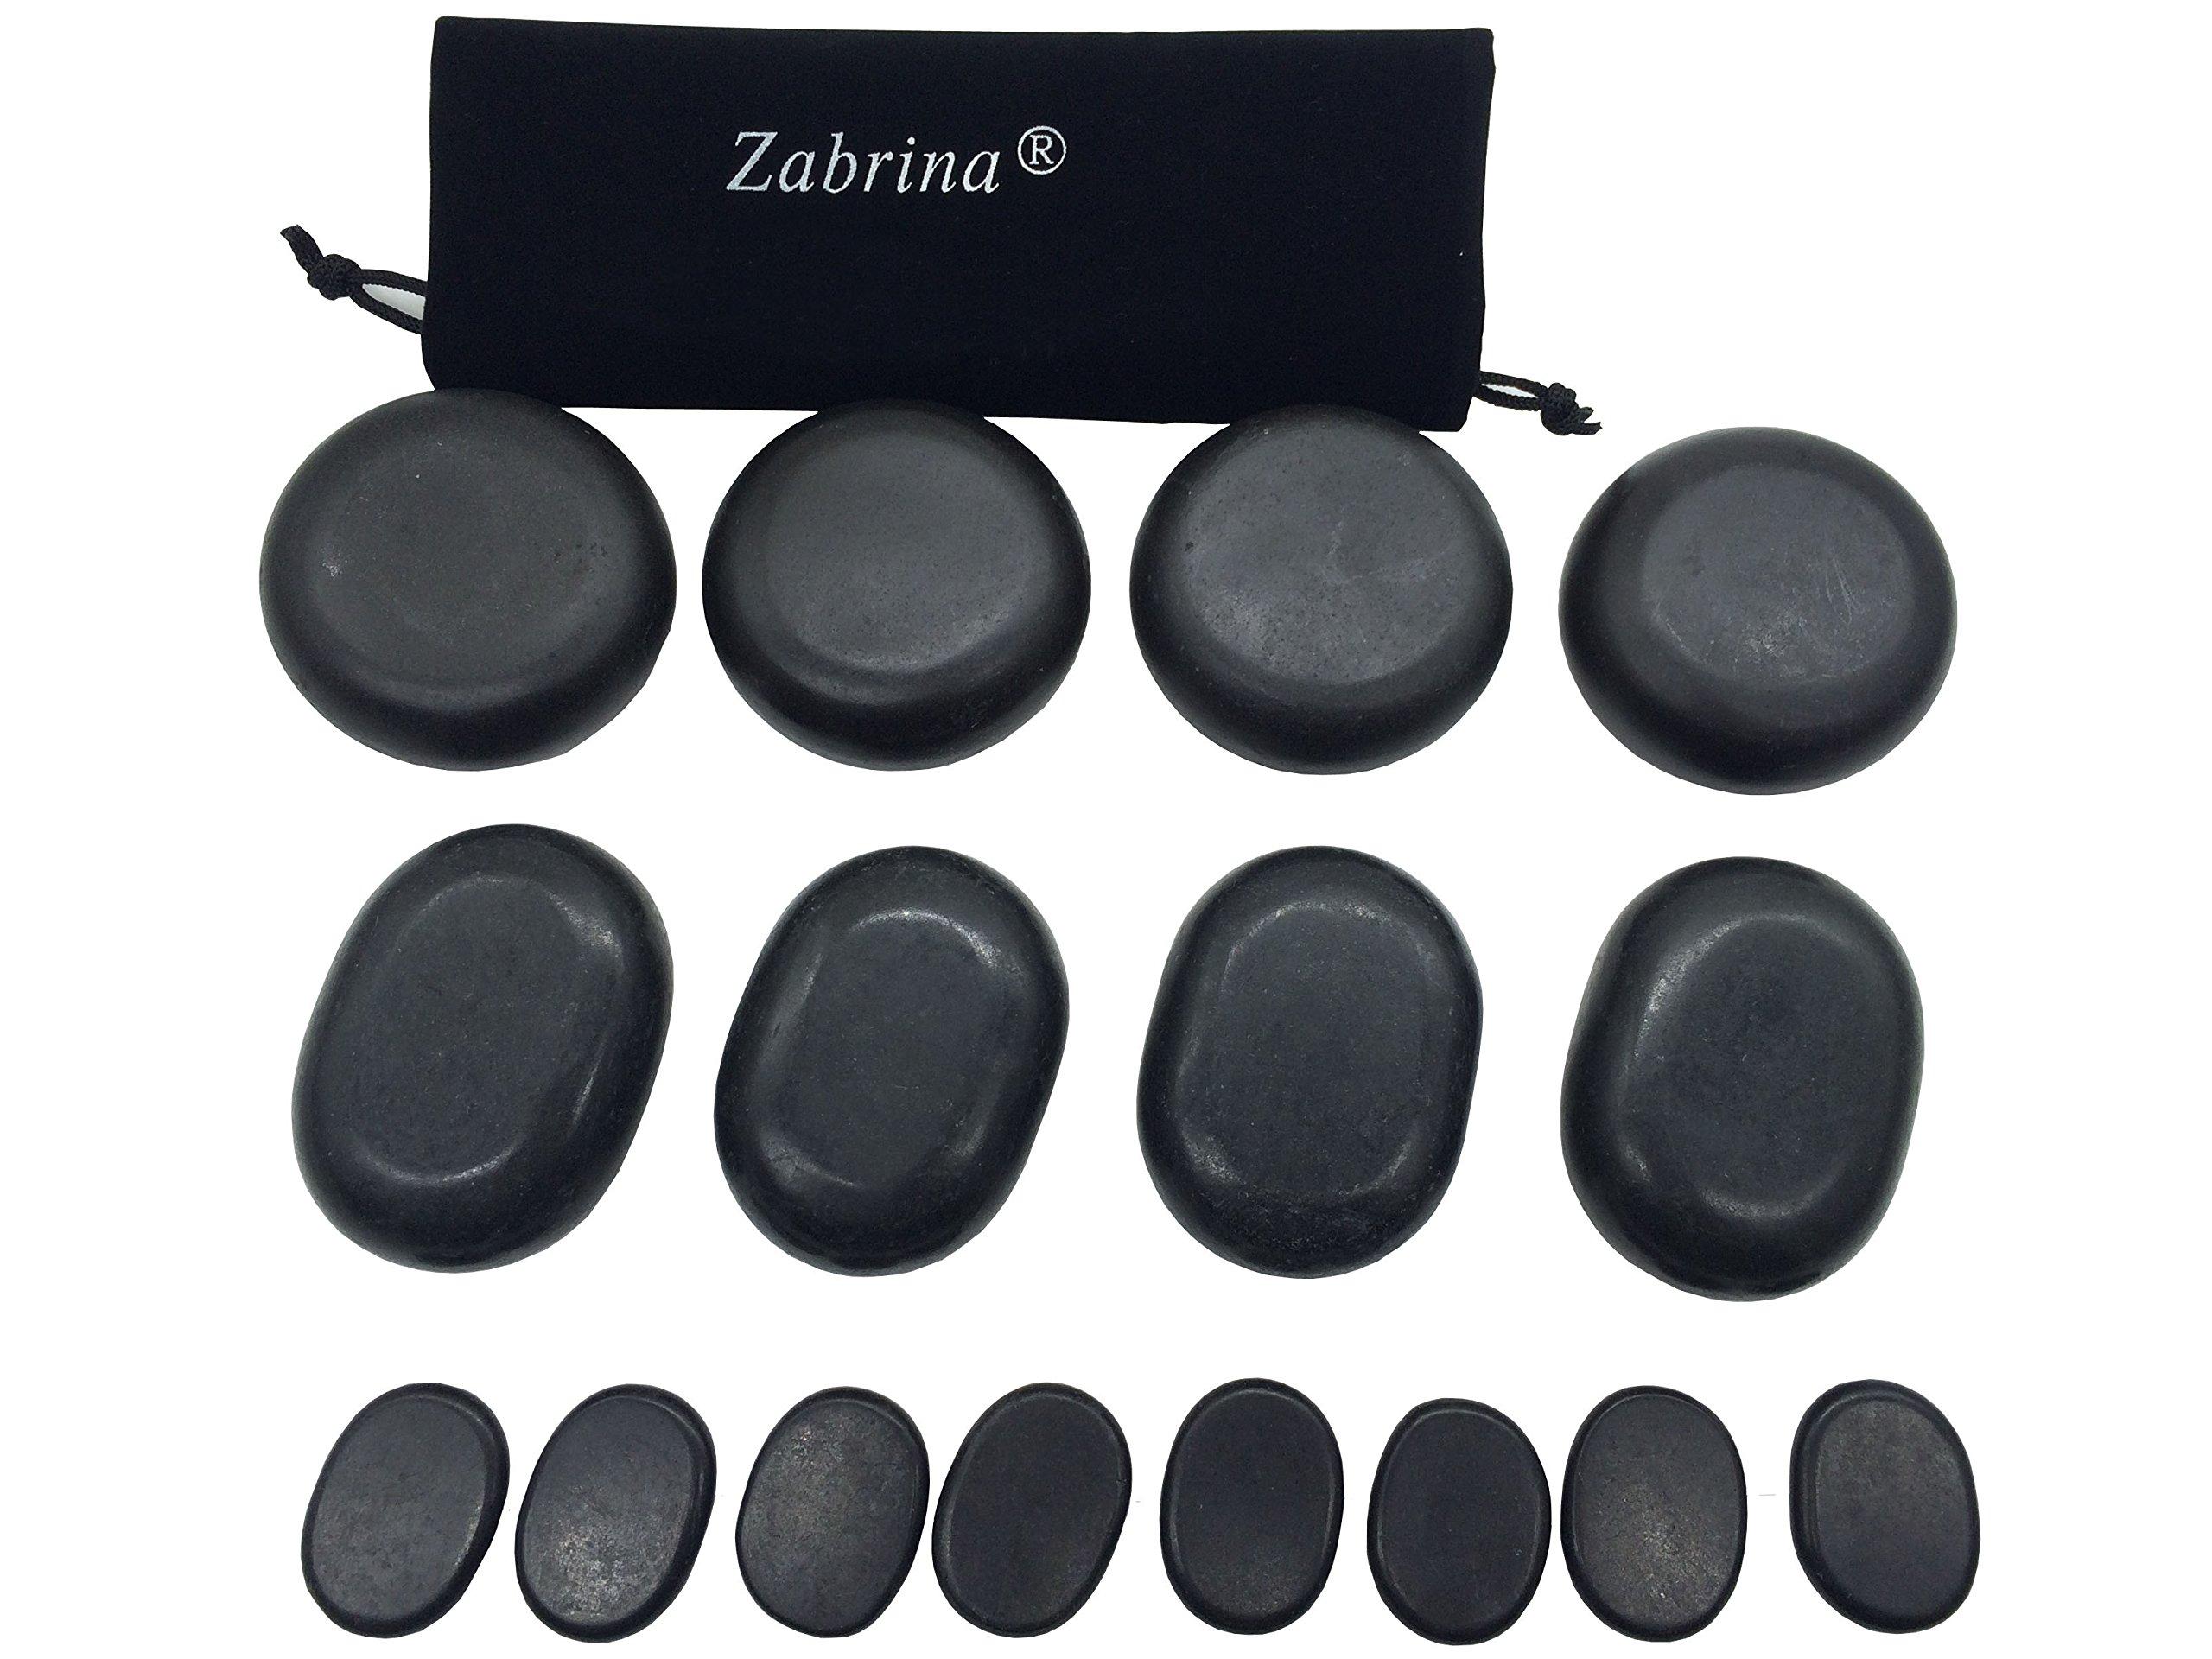 Zabrina 16 Pcs Professional Massage Hot Stone Set Basalt Hot Rocks Stones